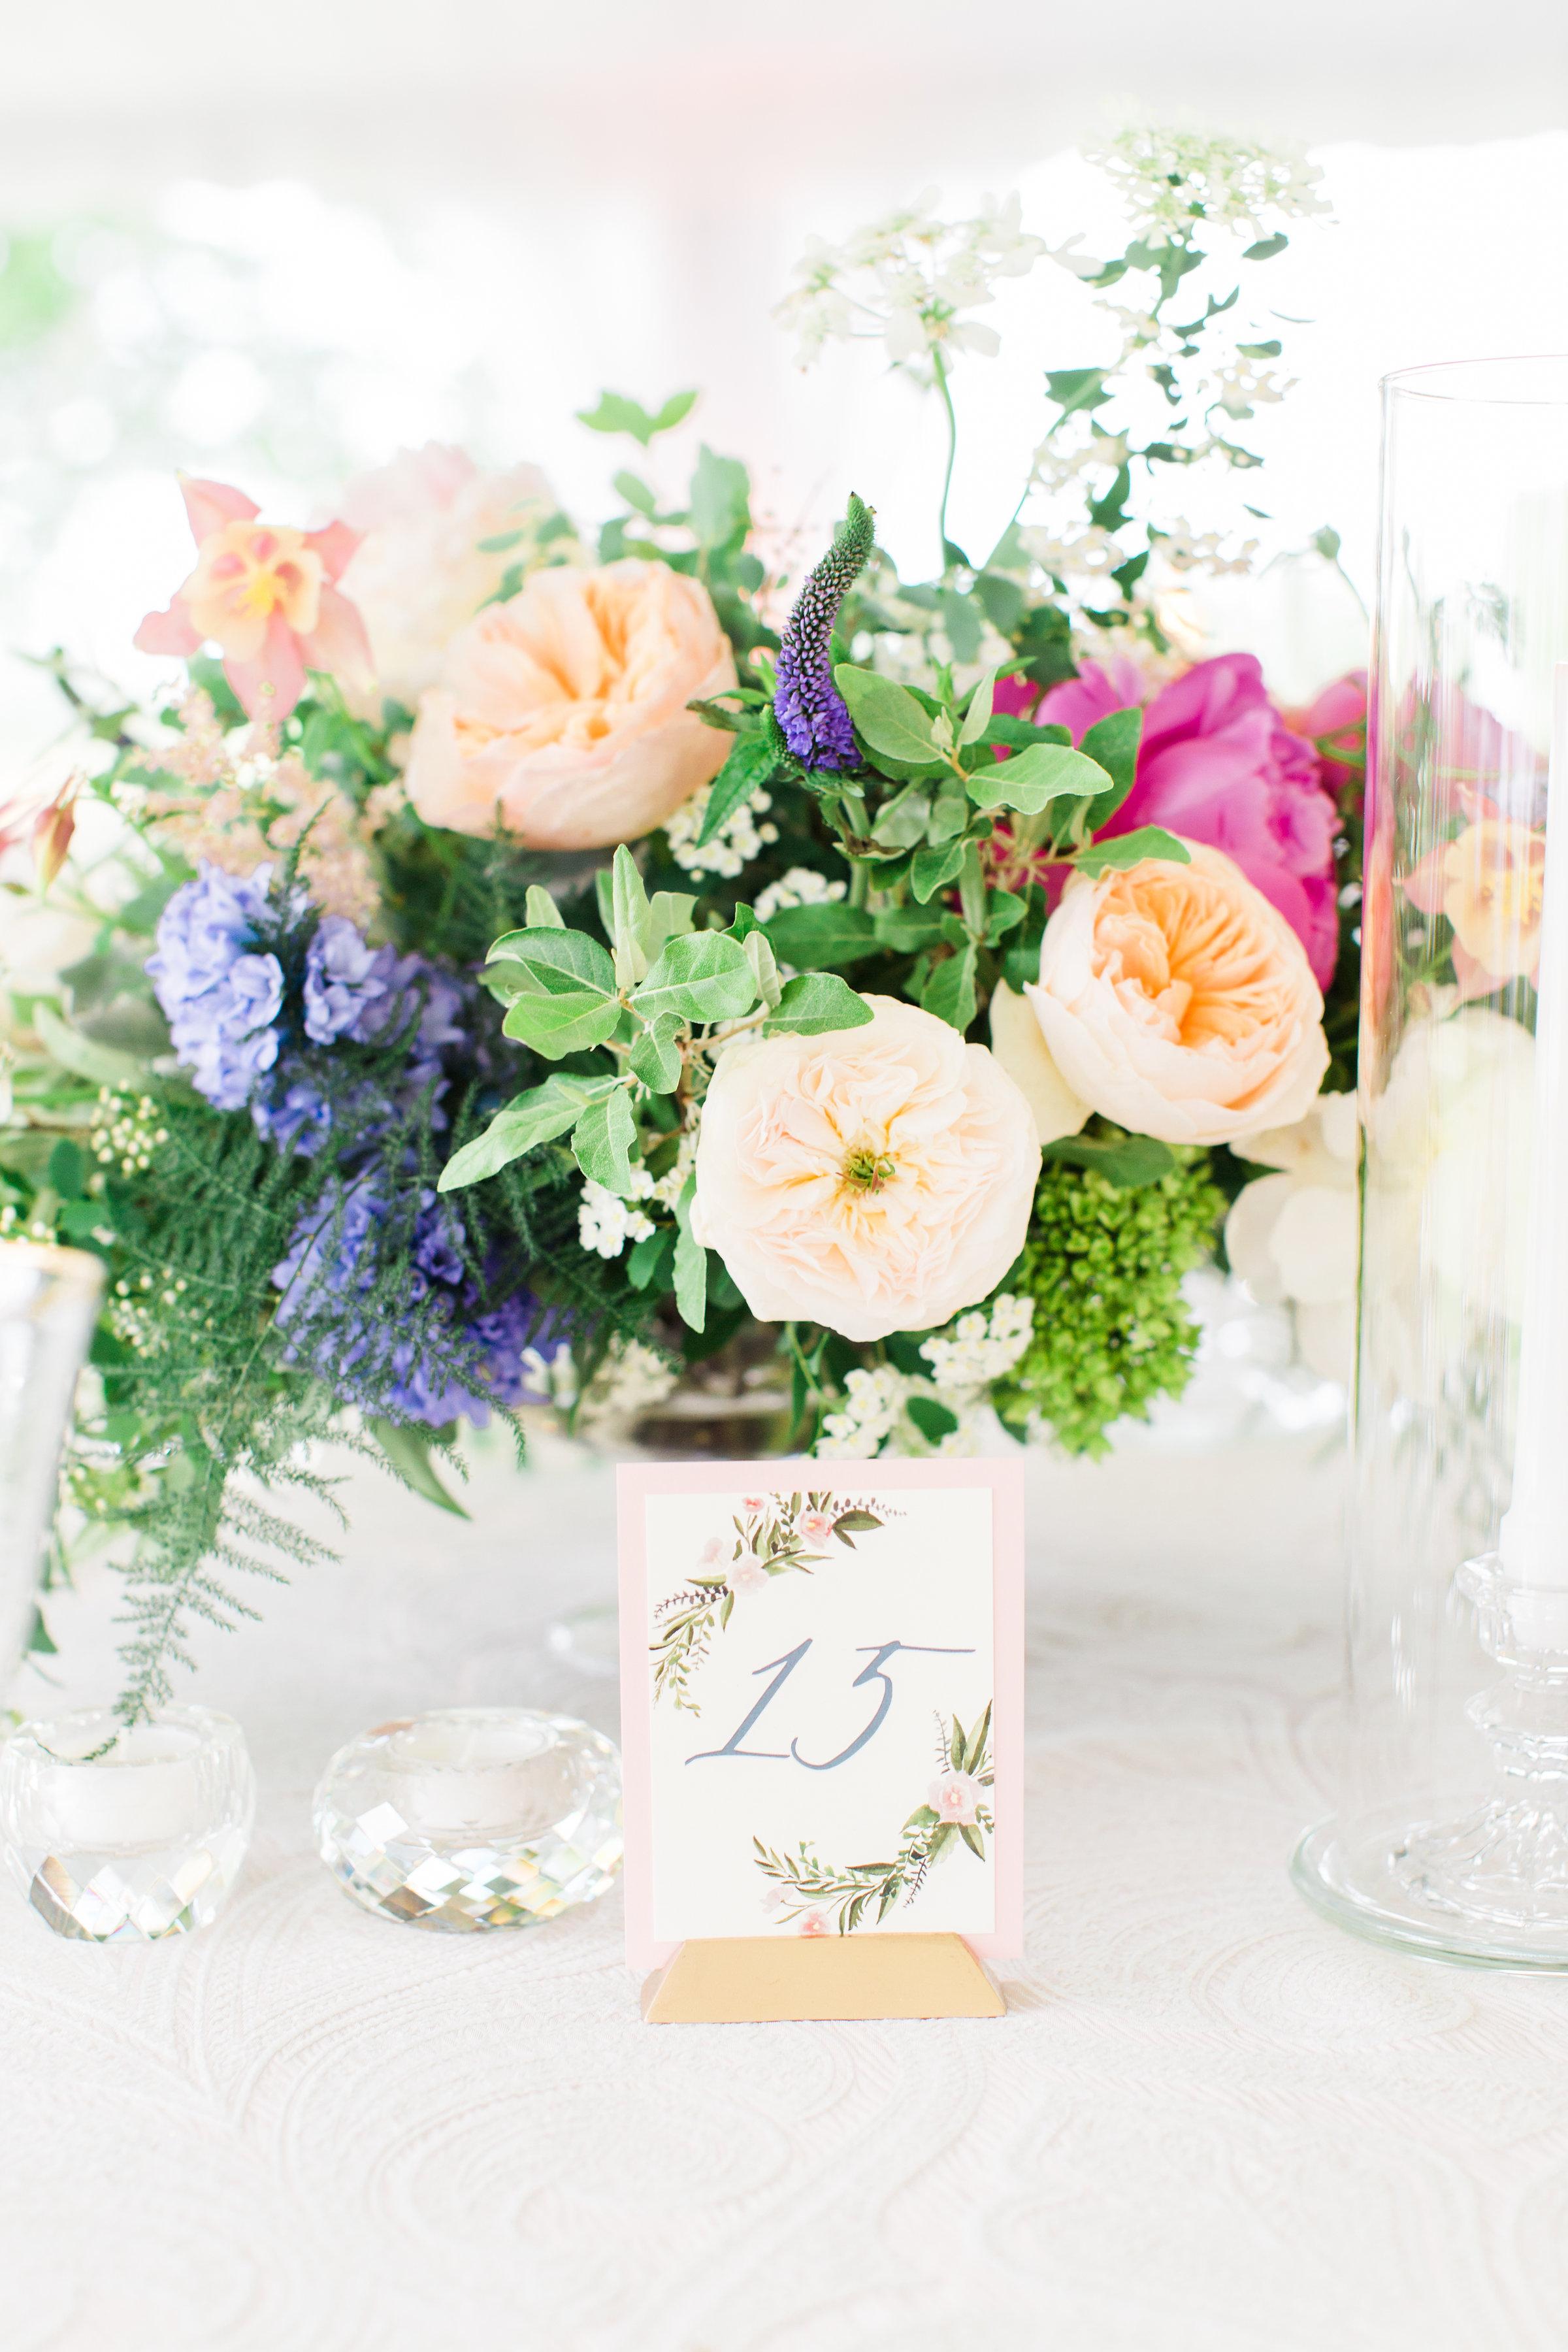 Coffman+Wedding+Reception+Details-49.jpg